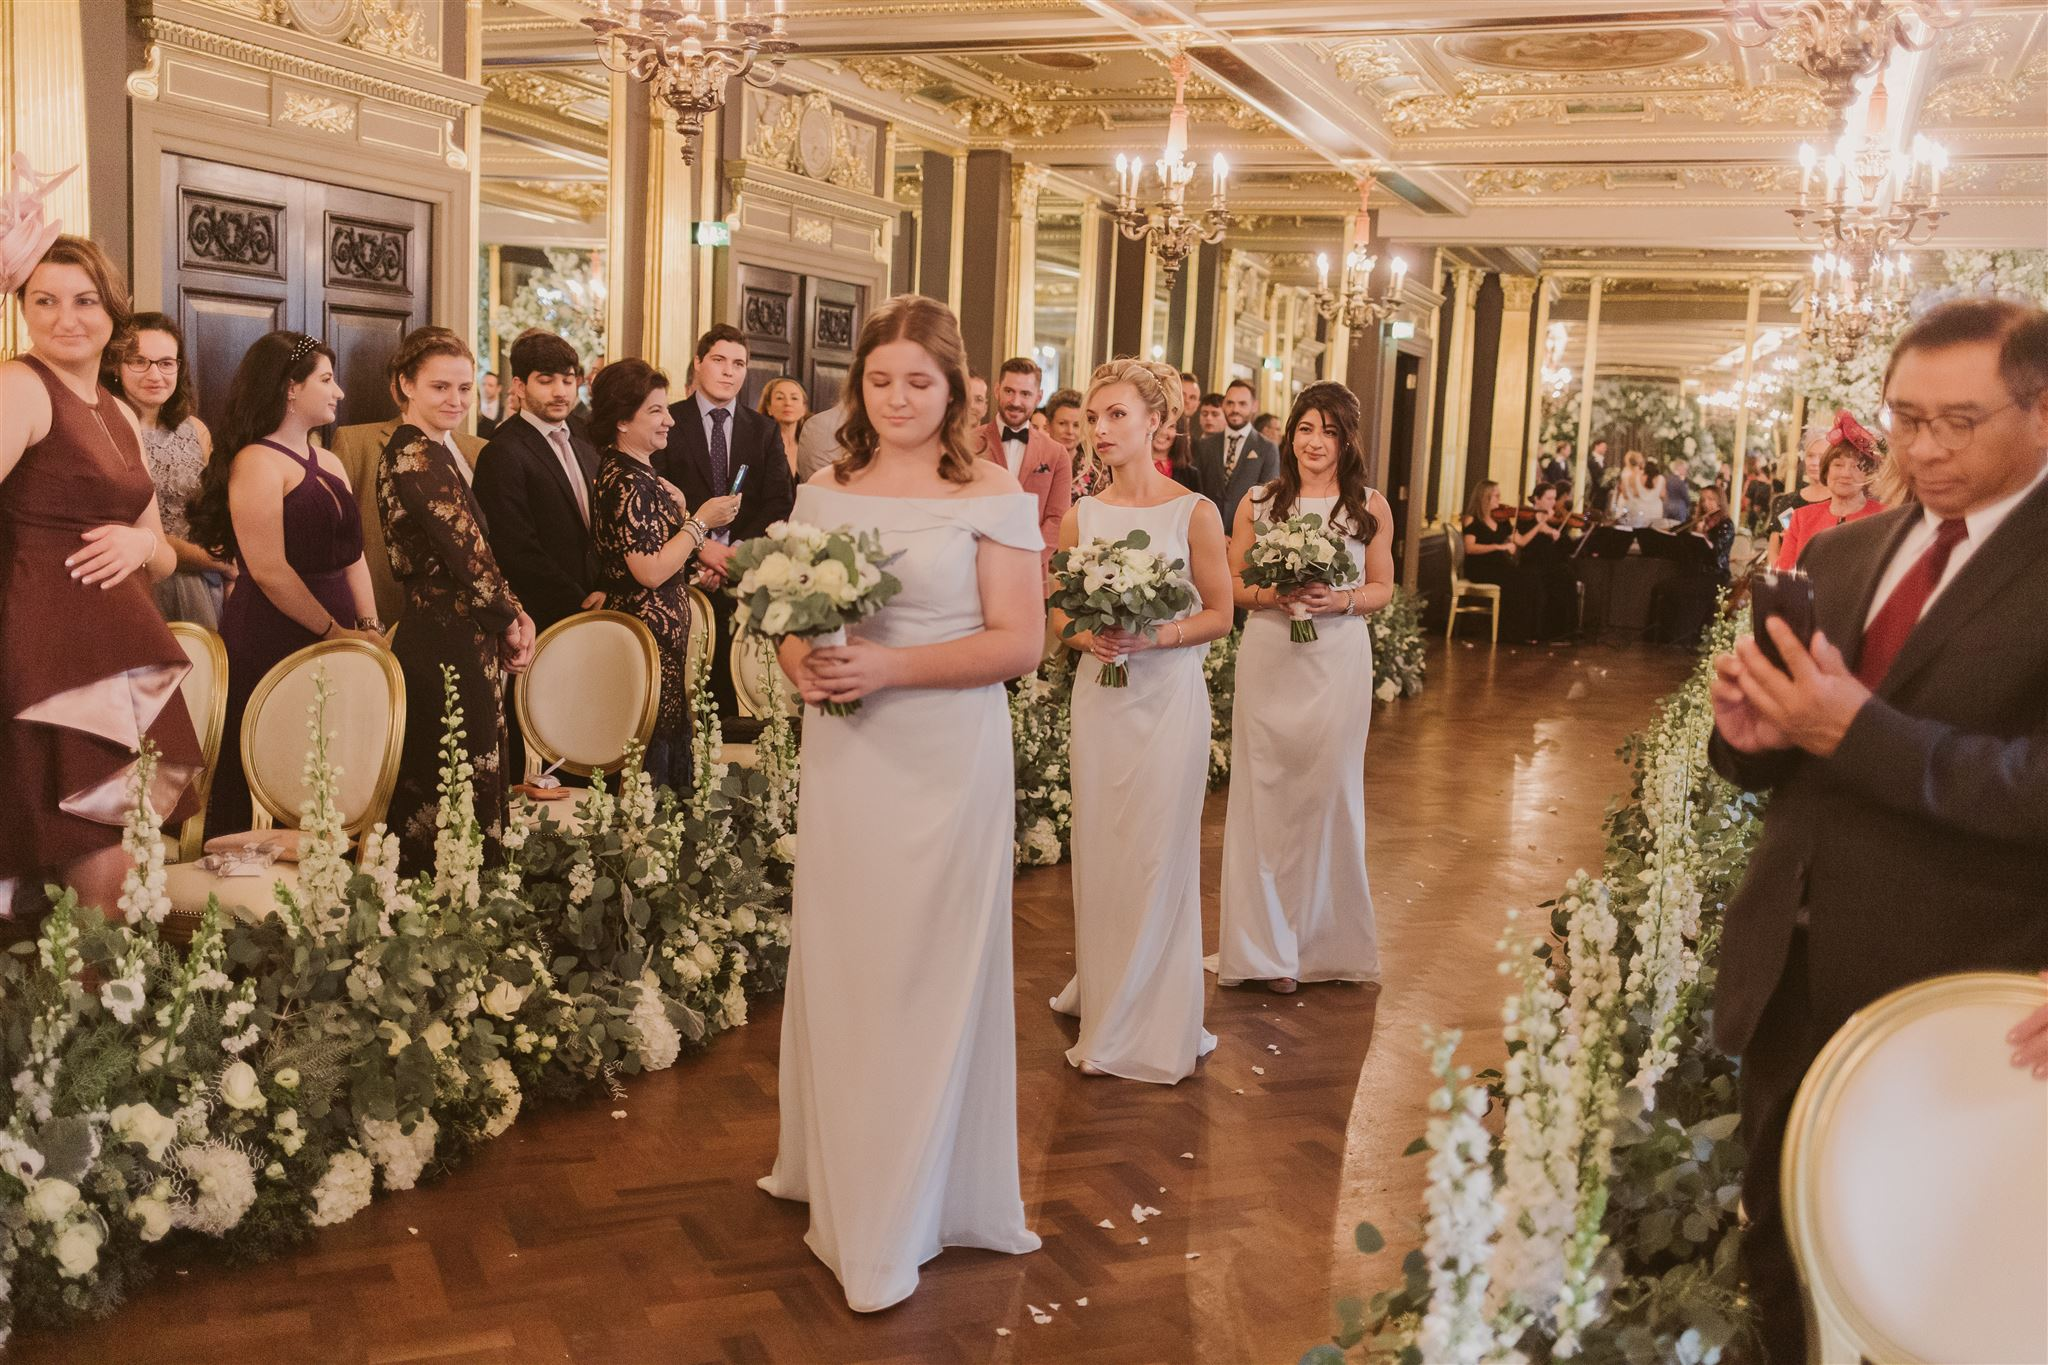 Bridesmaids bouquets at Cafe Royal, London